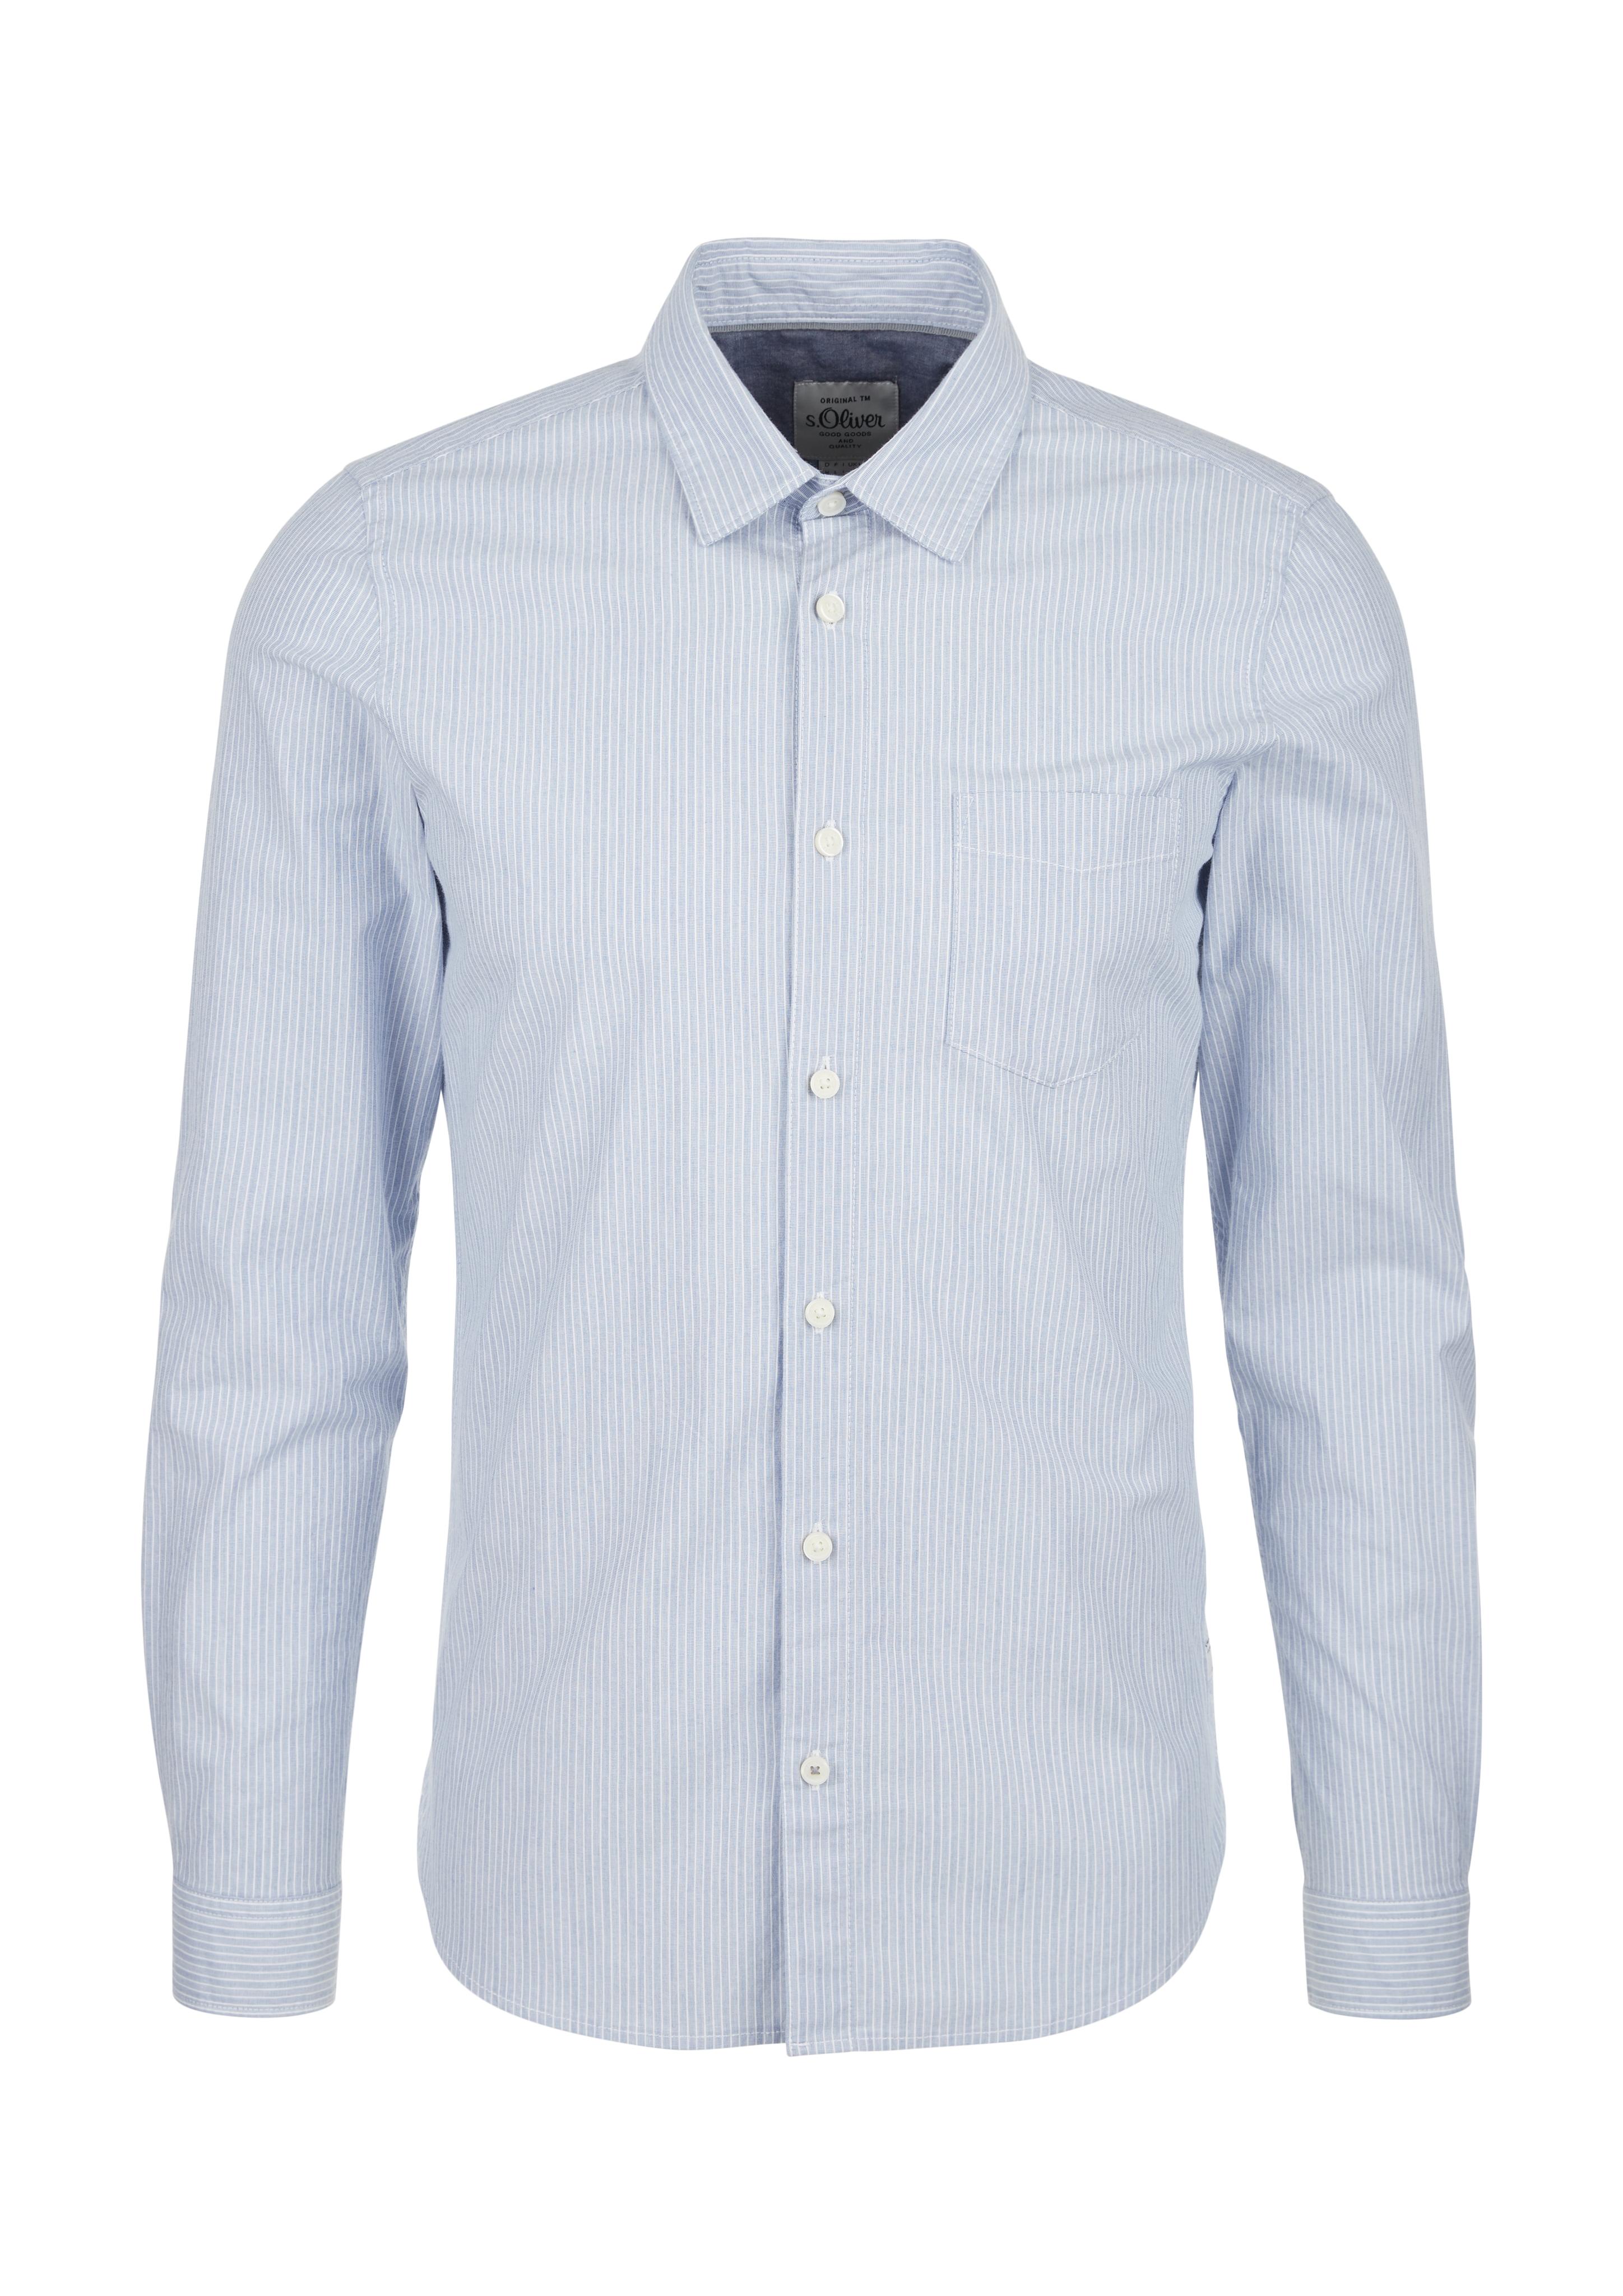 Baumwollstretch-Hemd